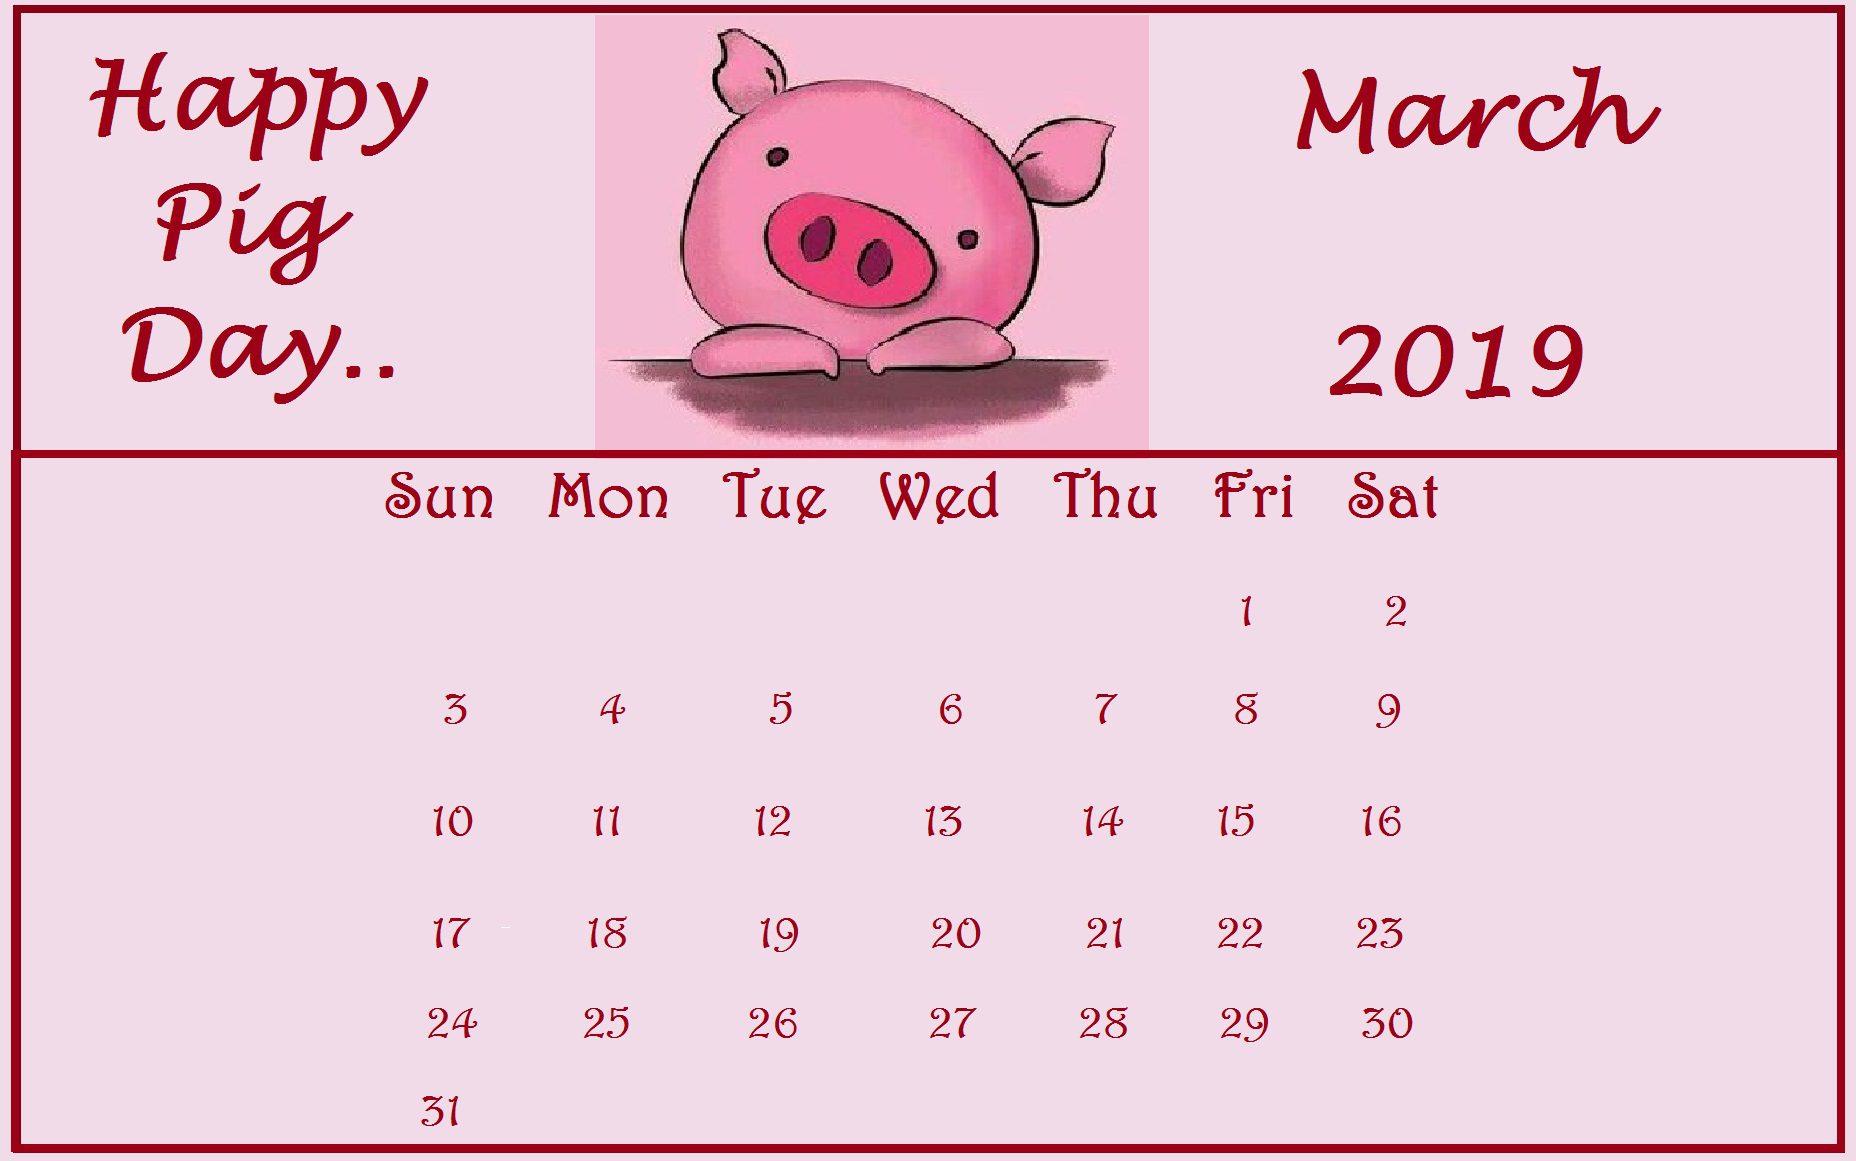 March 2019 free Desktop Calendar